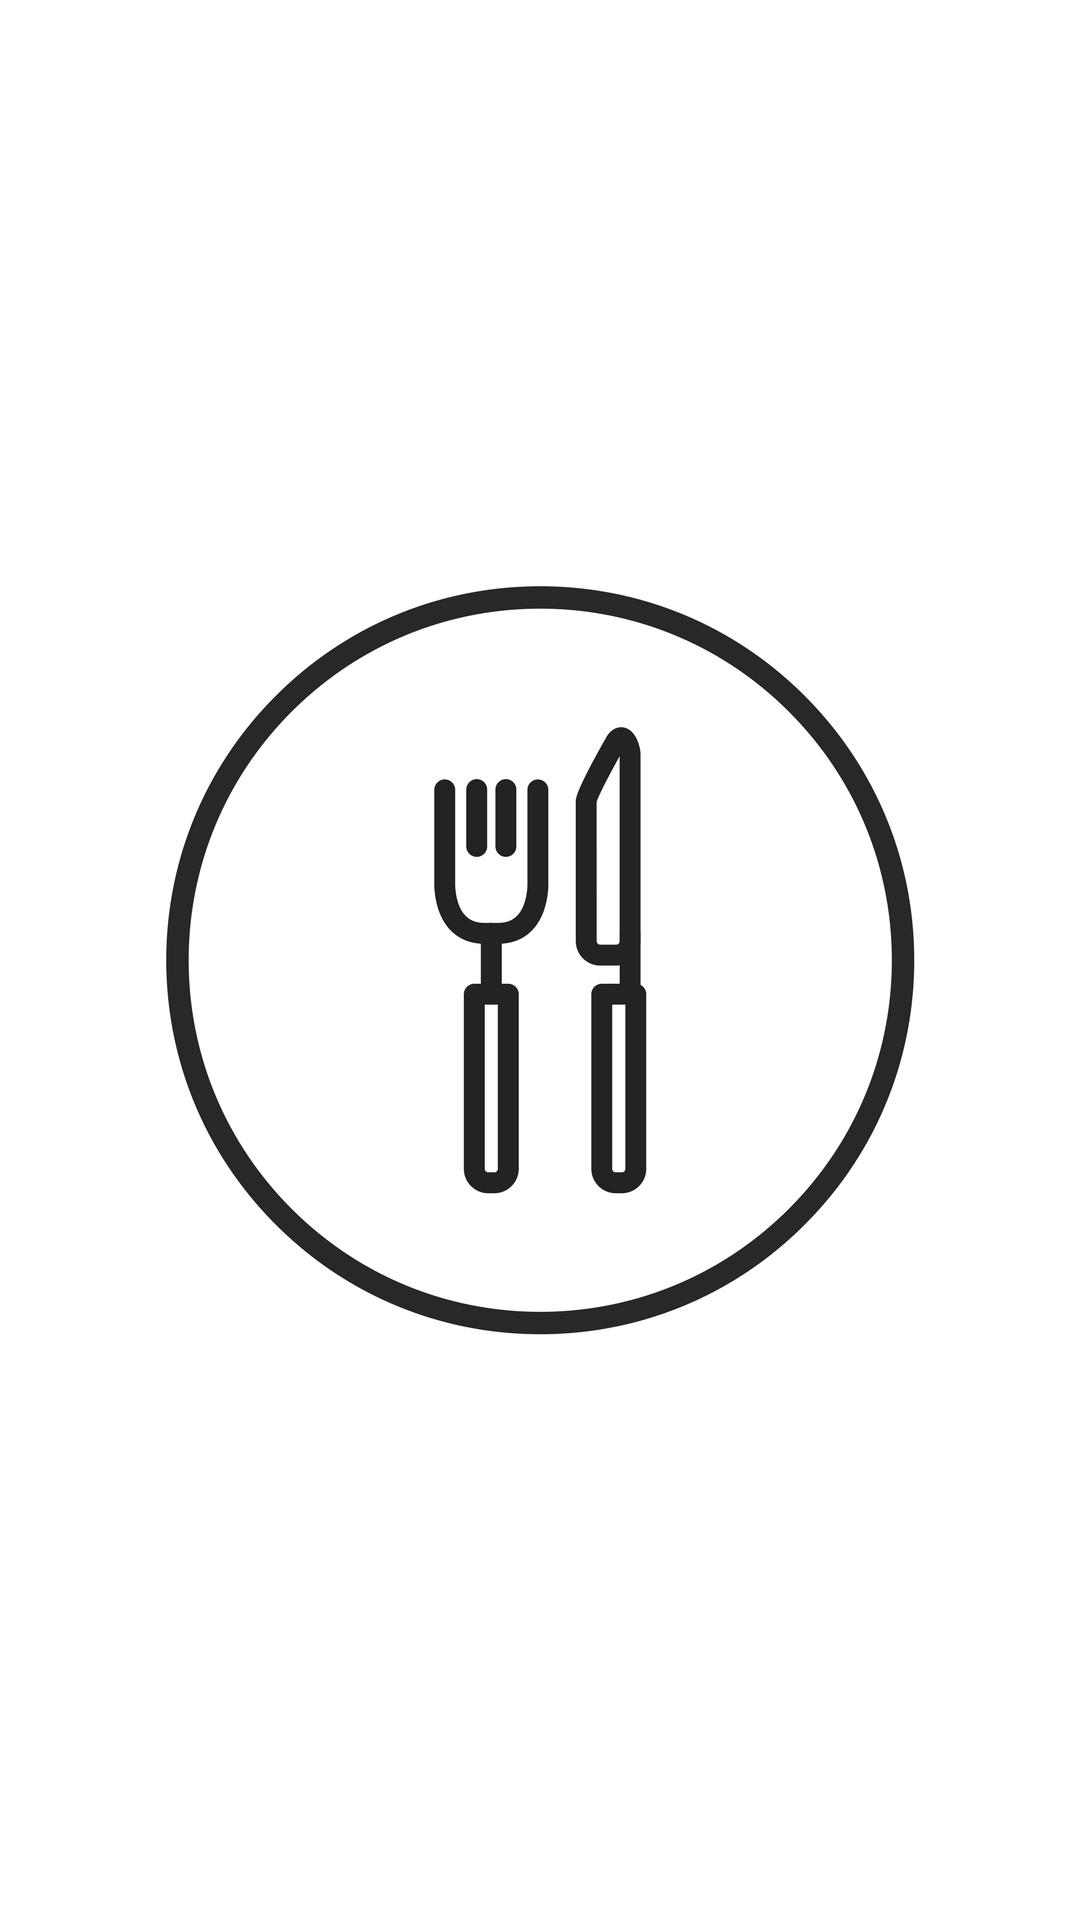 Instagram Highlight Cover Food White Minimalist Theme Logotipo Instagram Instagram Dicas Ideias Instagram